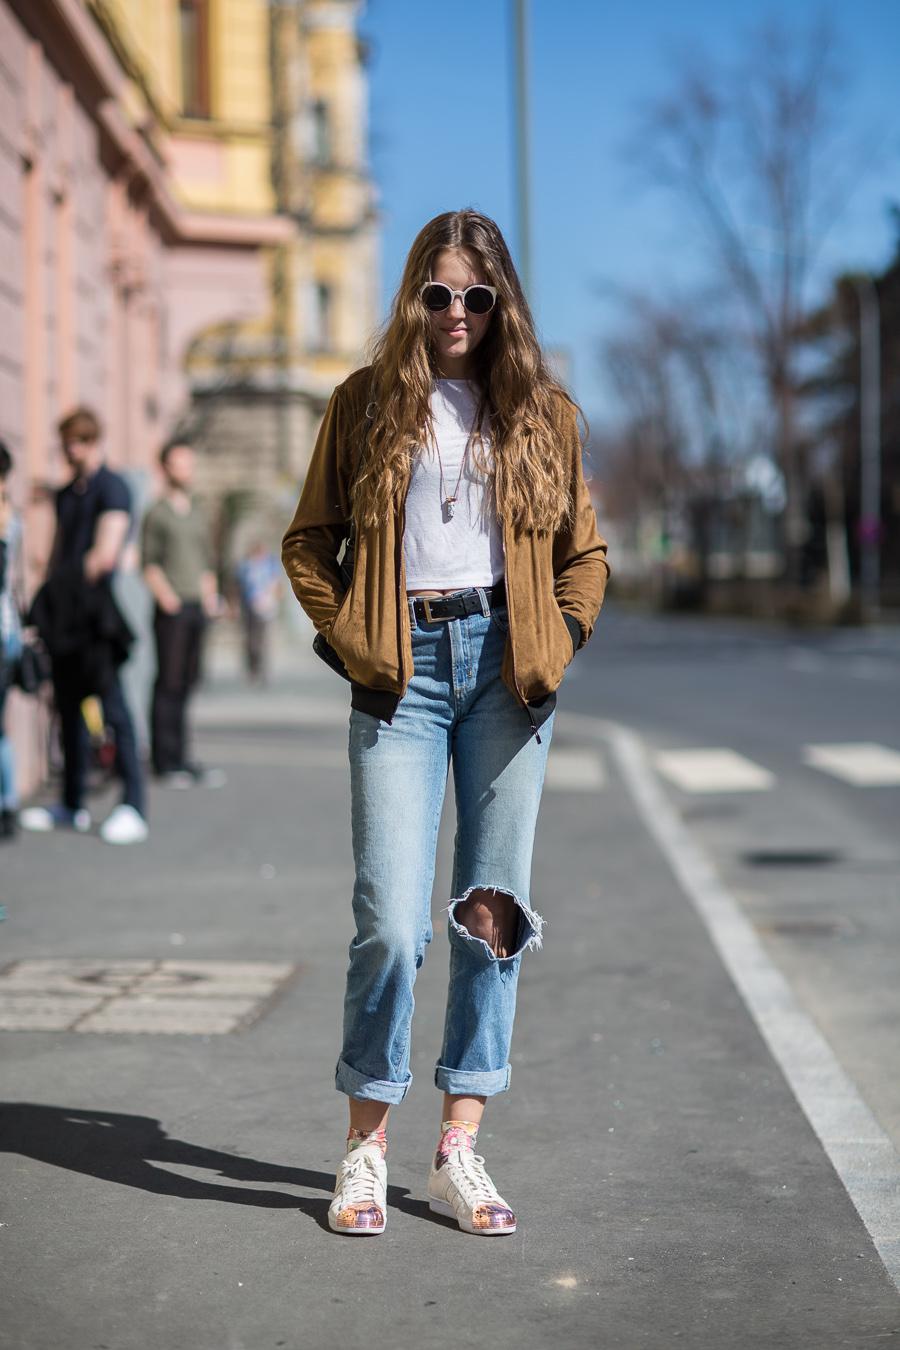 street-style-fashion-blog-innsbruck-vintage-markt.jpg